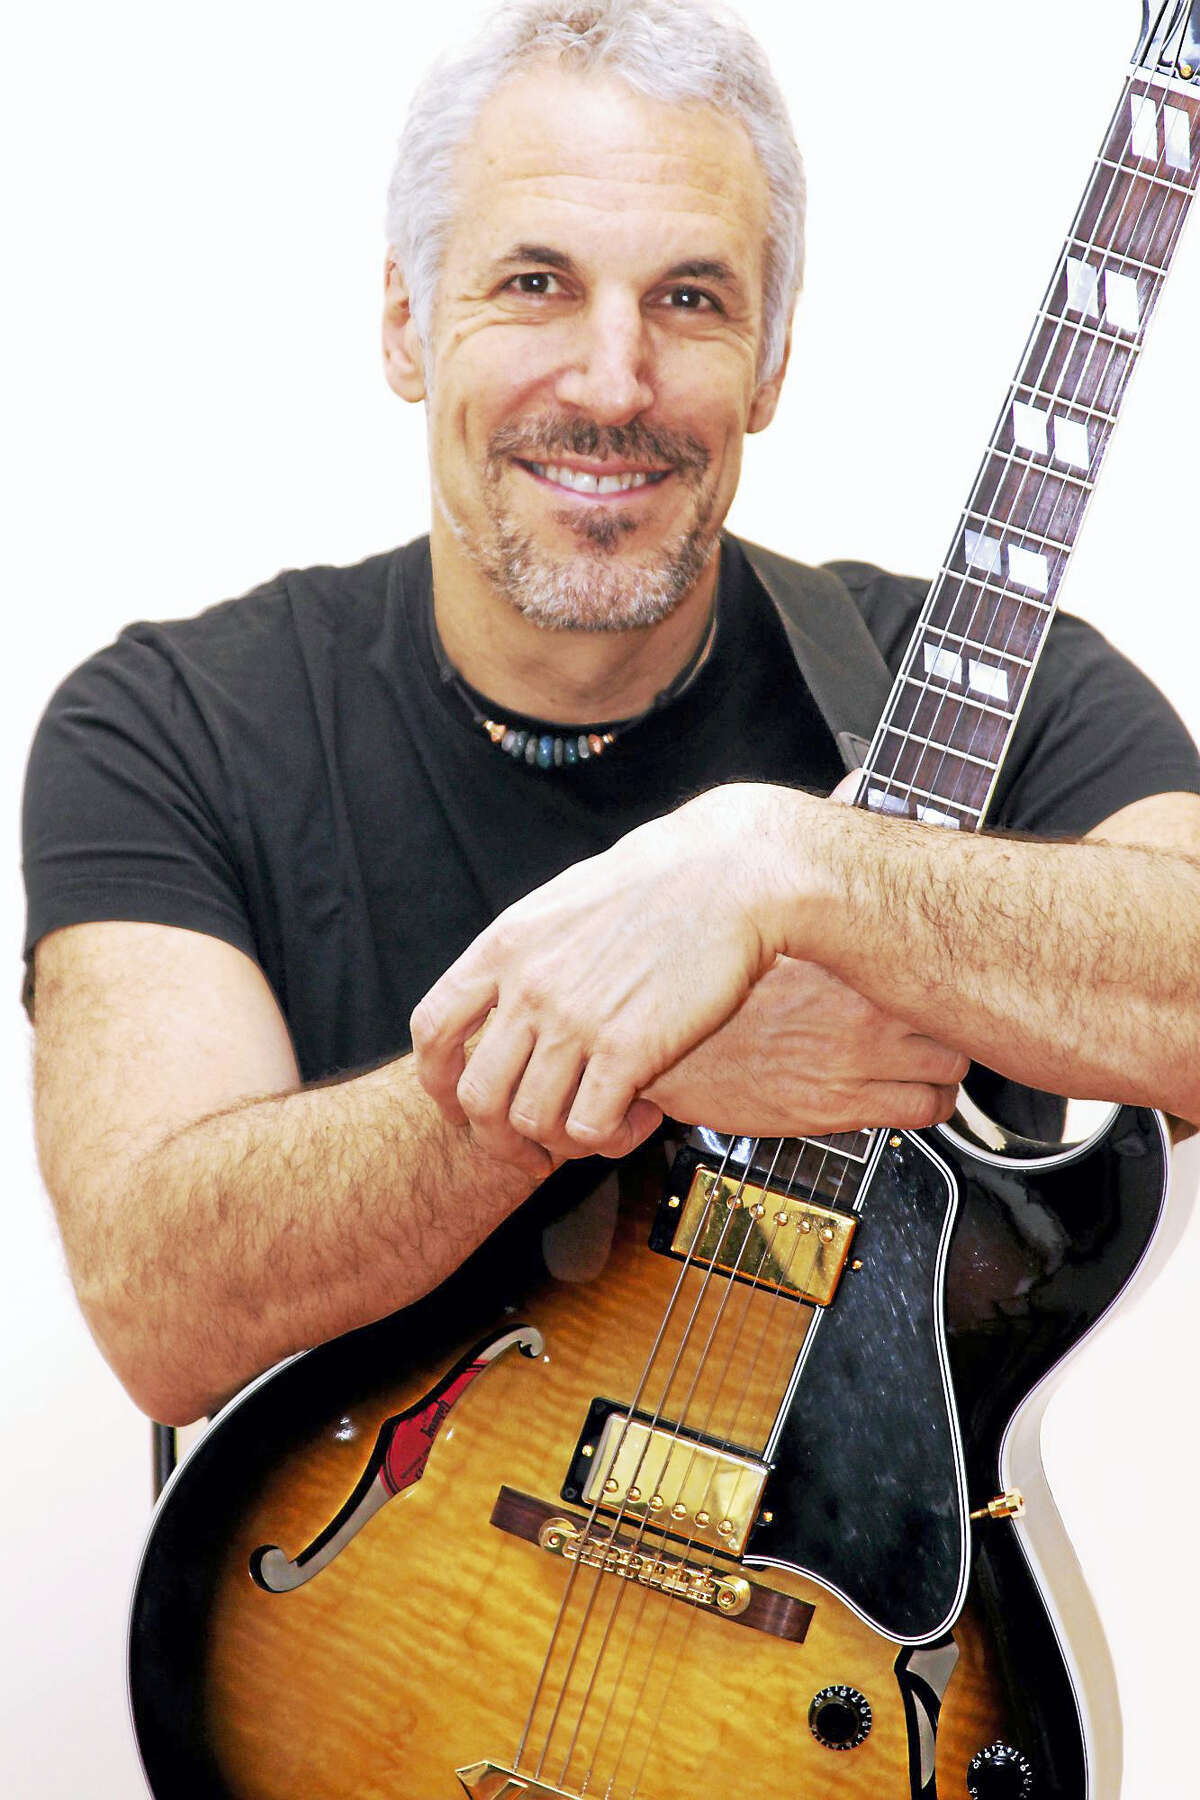 Jeff Pevar performs at Infinity Hall in Hartford Nov. 23.